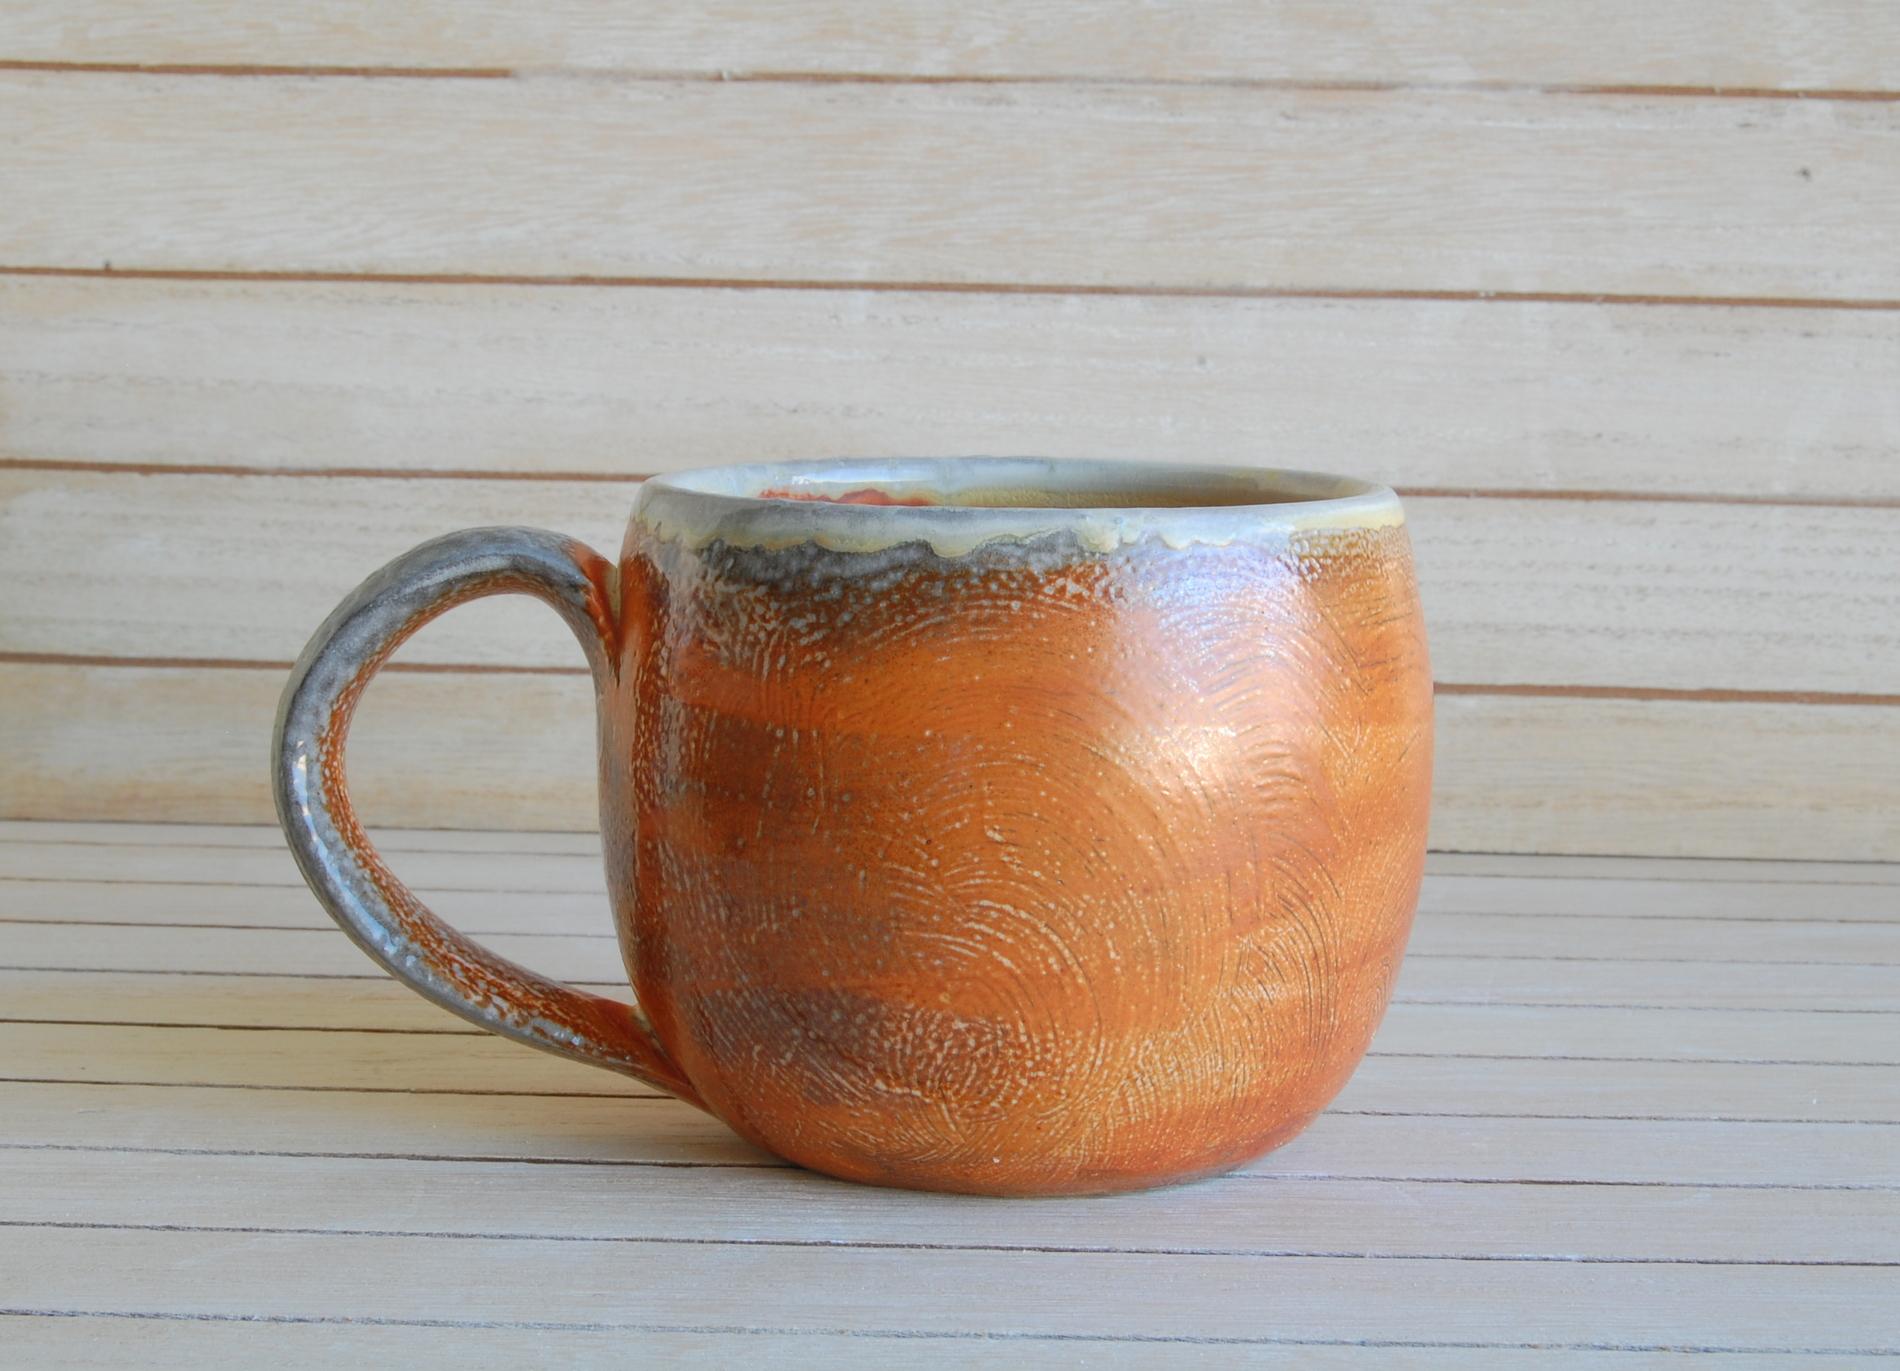 Hand made ceramic mug with orange slip, hand made